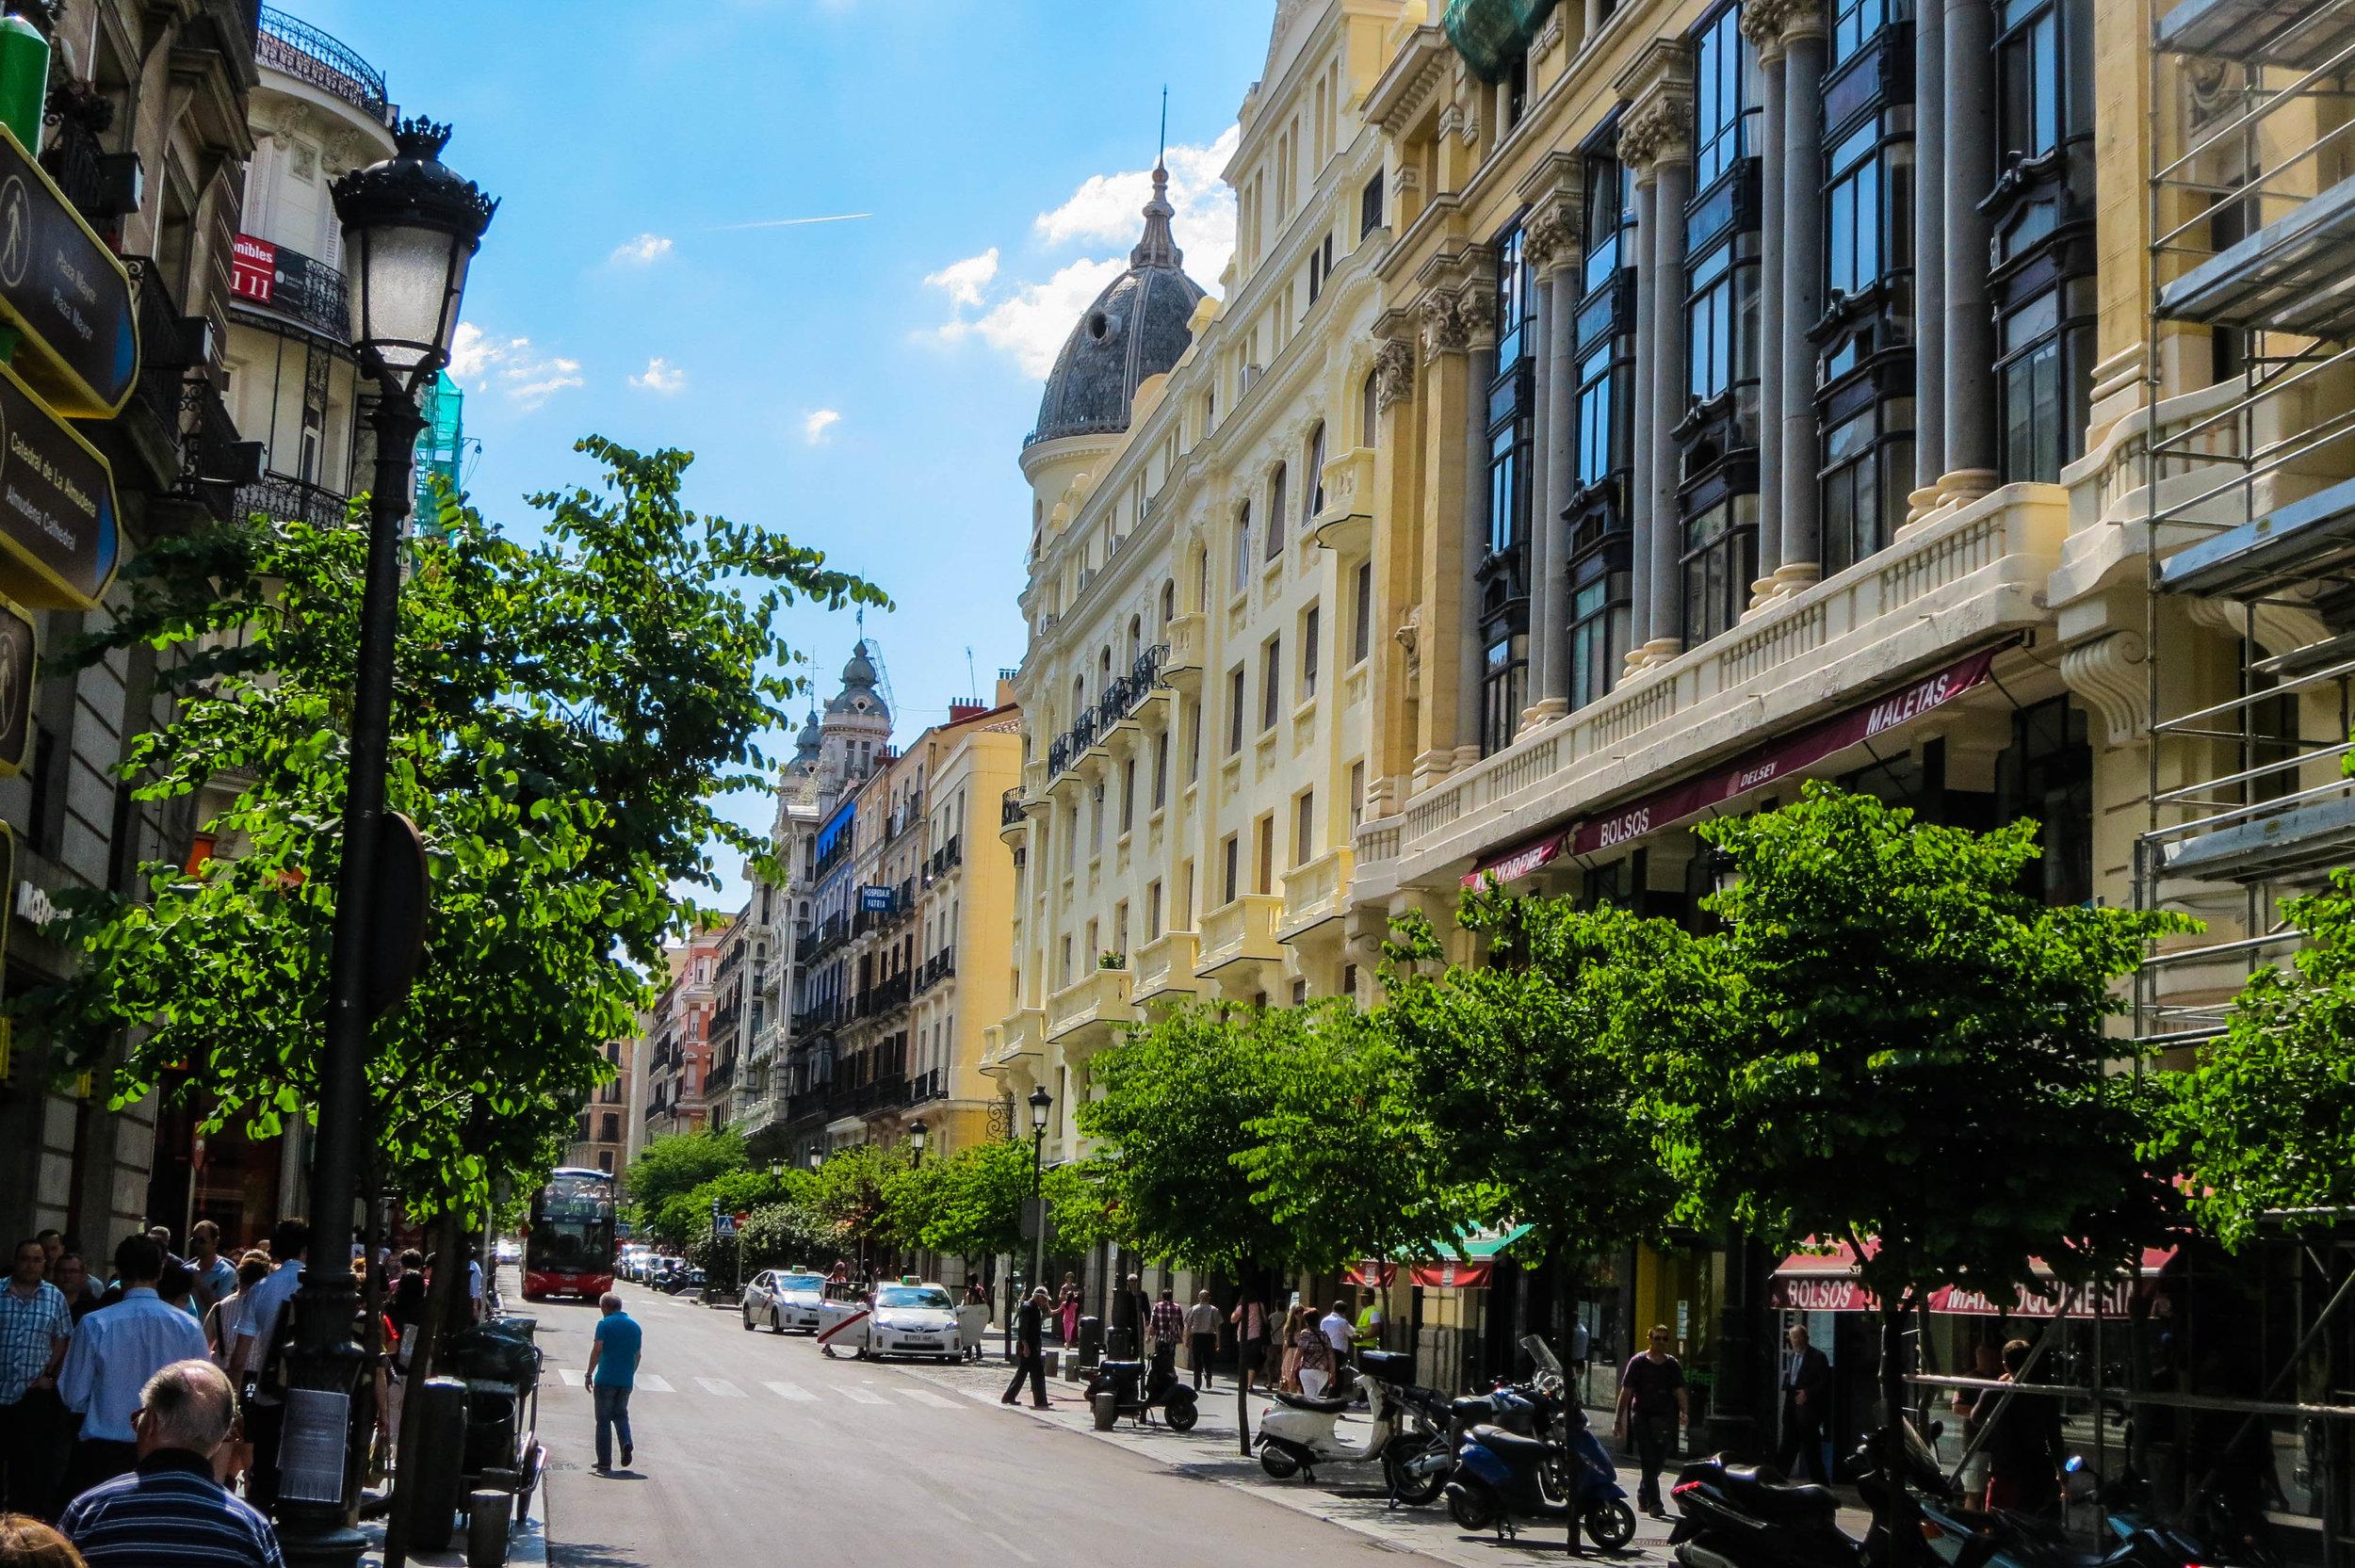 madrid-spain-streets-summer-21.jpg